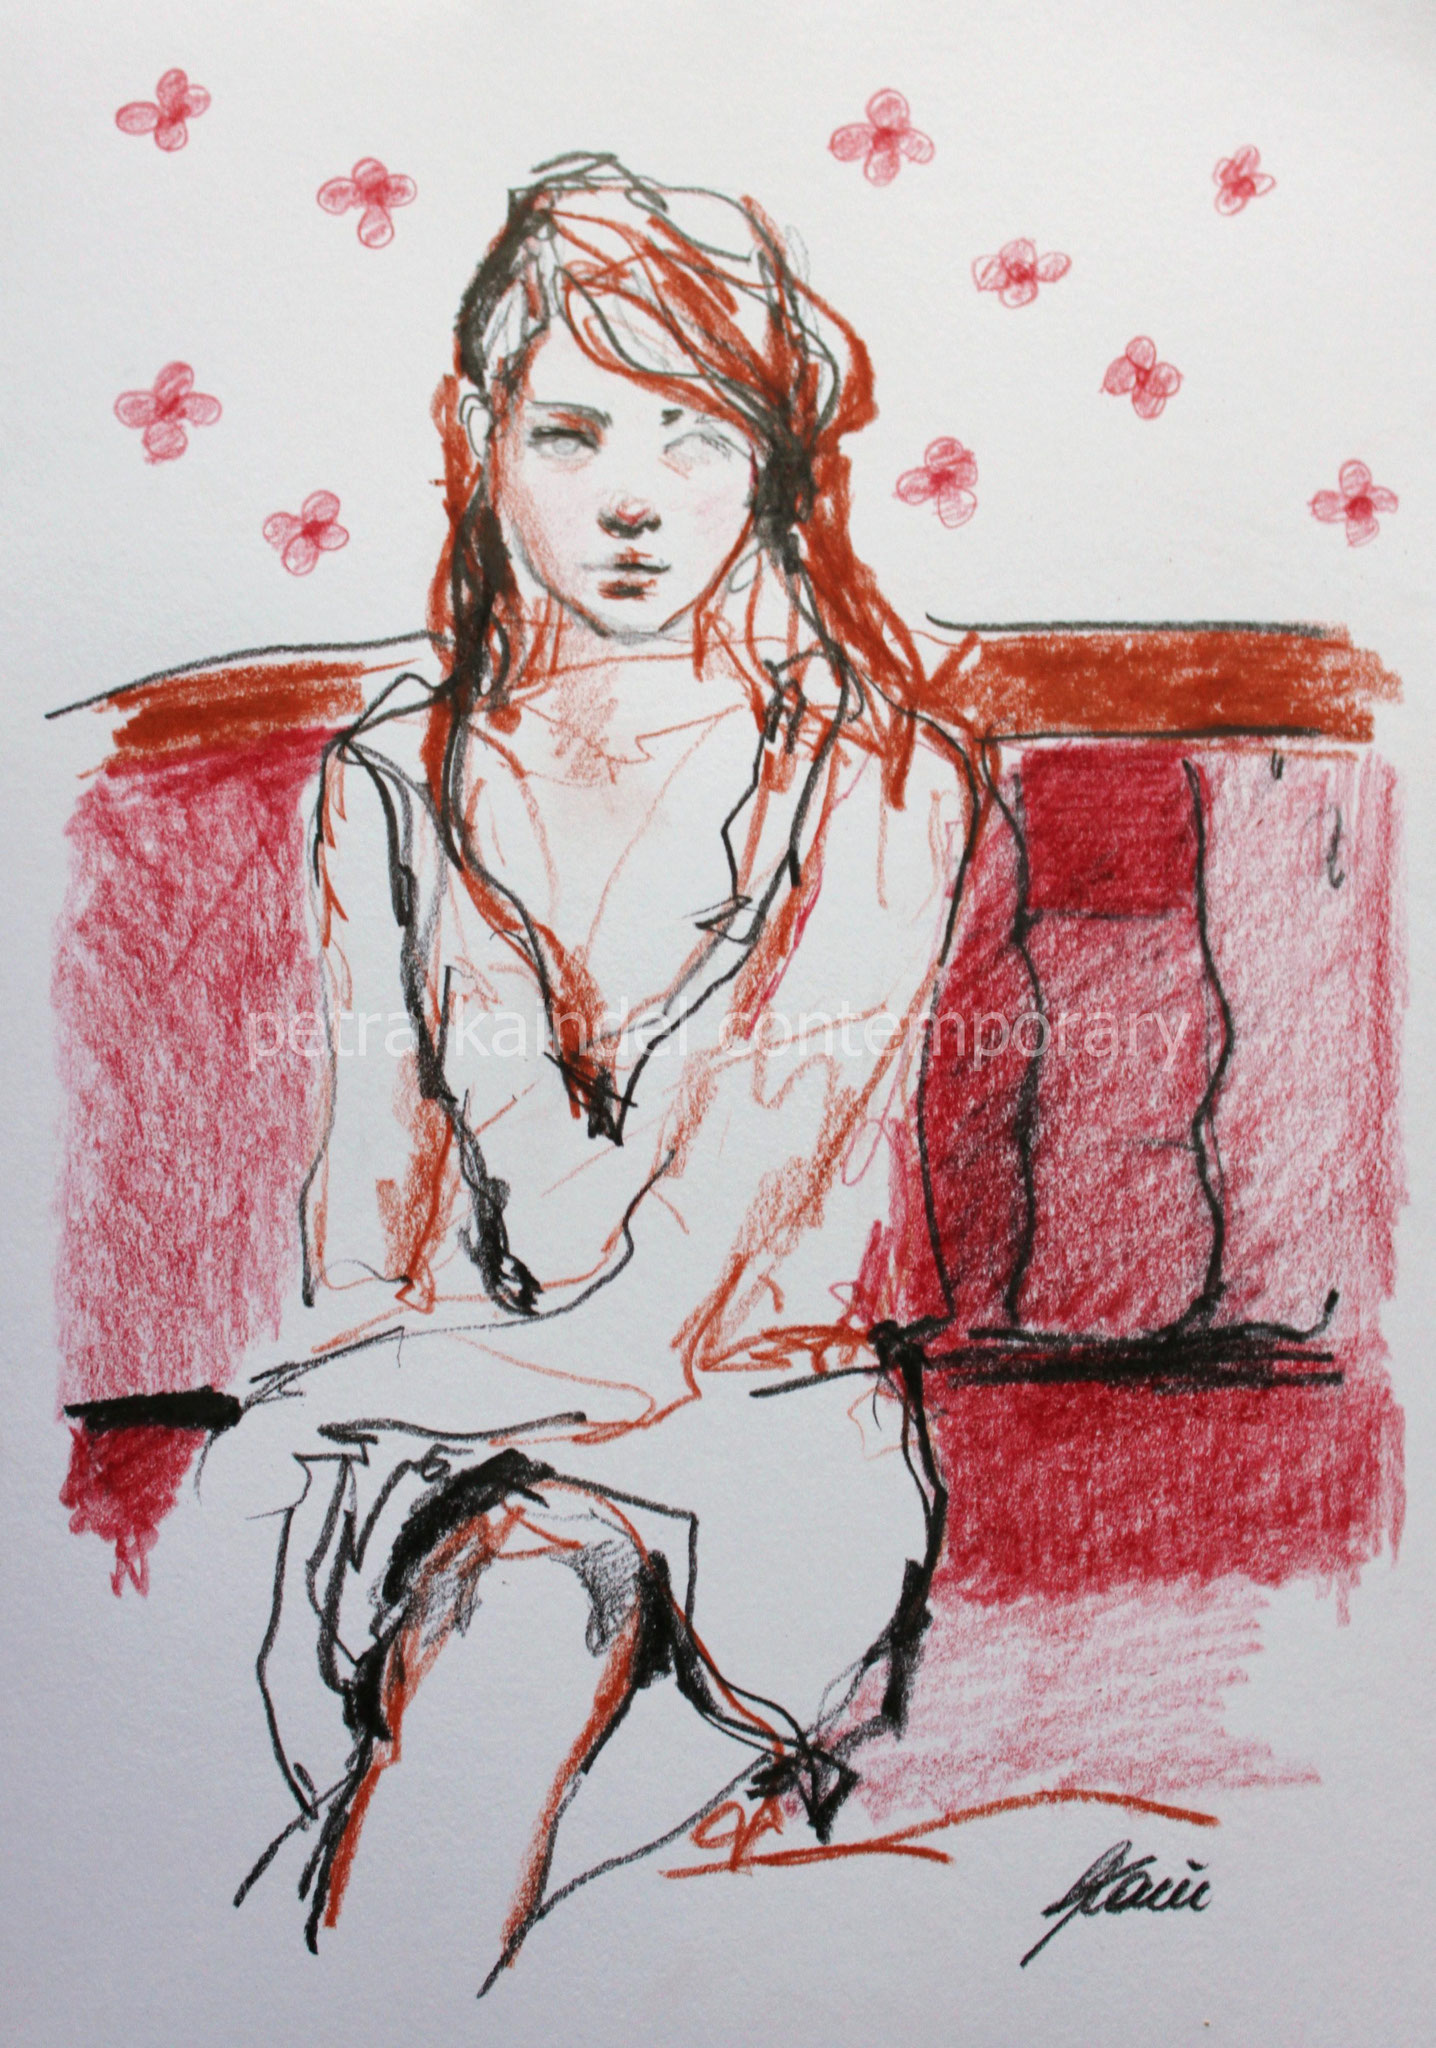 """Flowers"" 21 x 29,7 cm, pencils on paper"